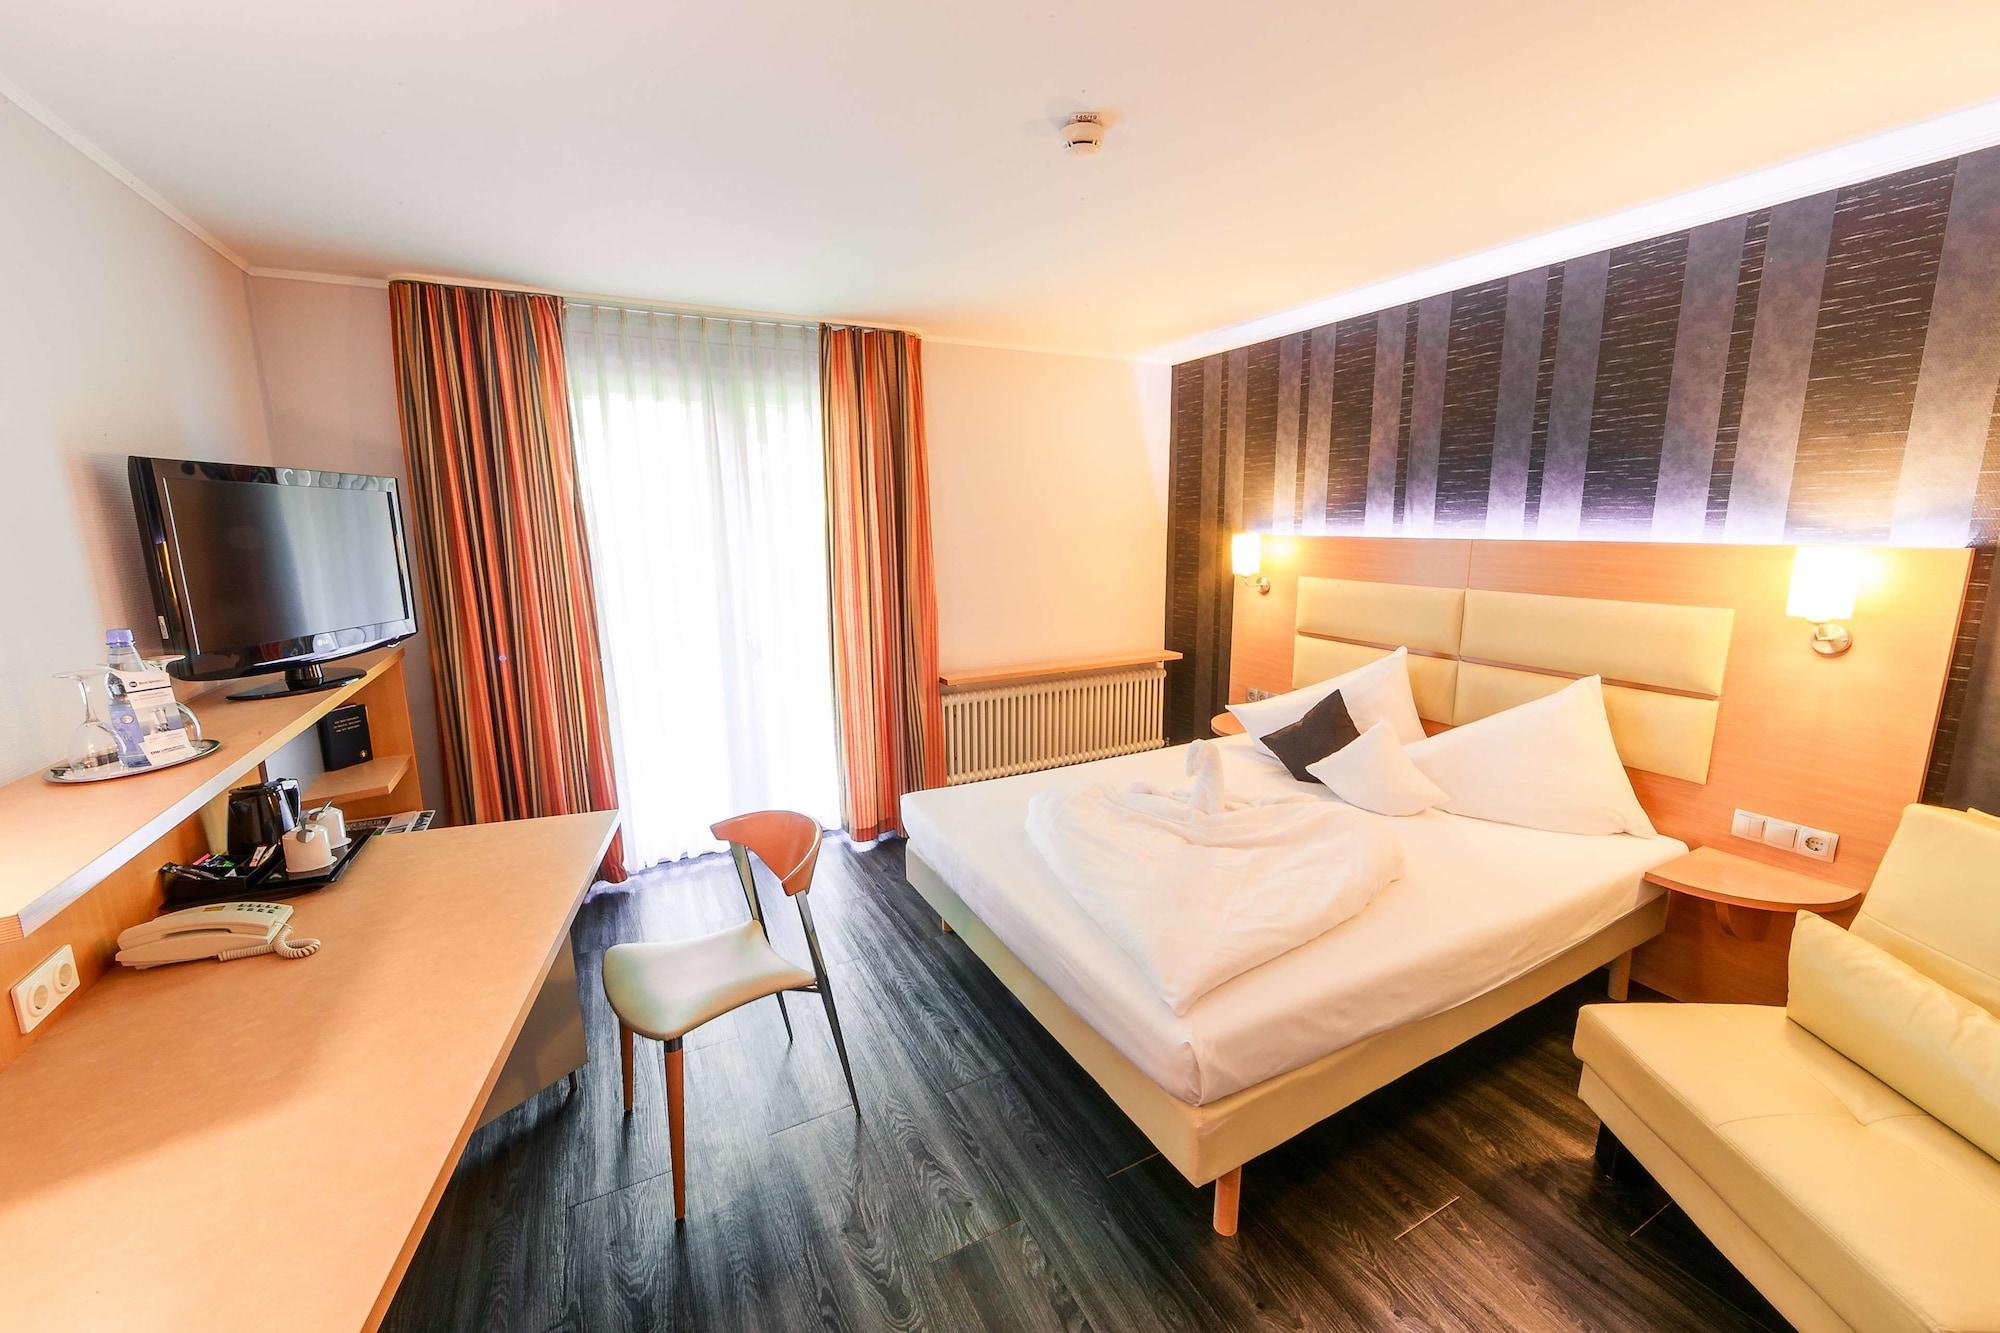 Best Western Plazahotel Stuttgart-Ditzingen, Ludwigsburg